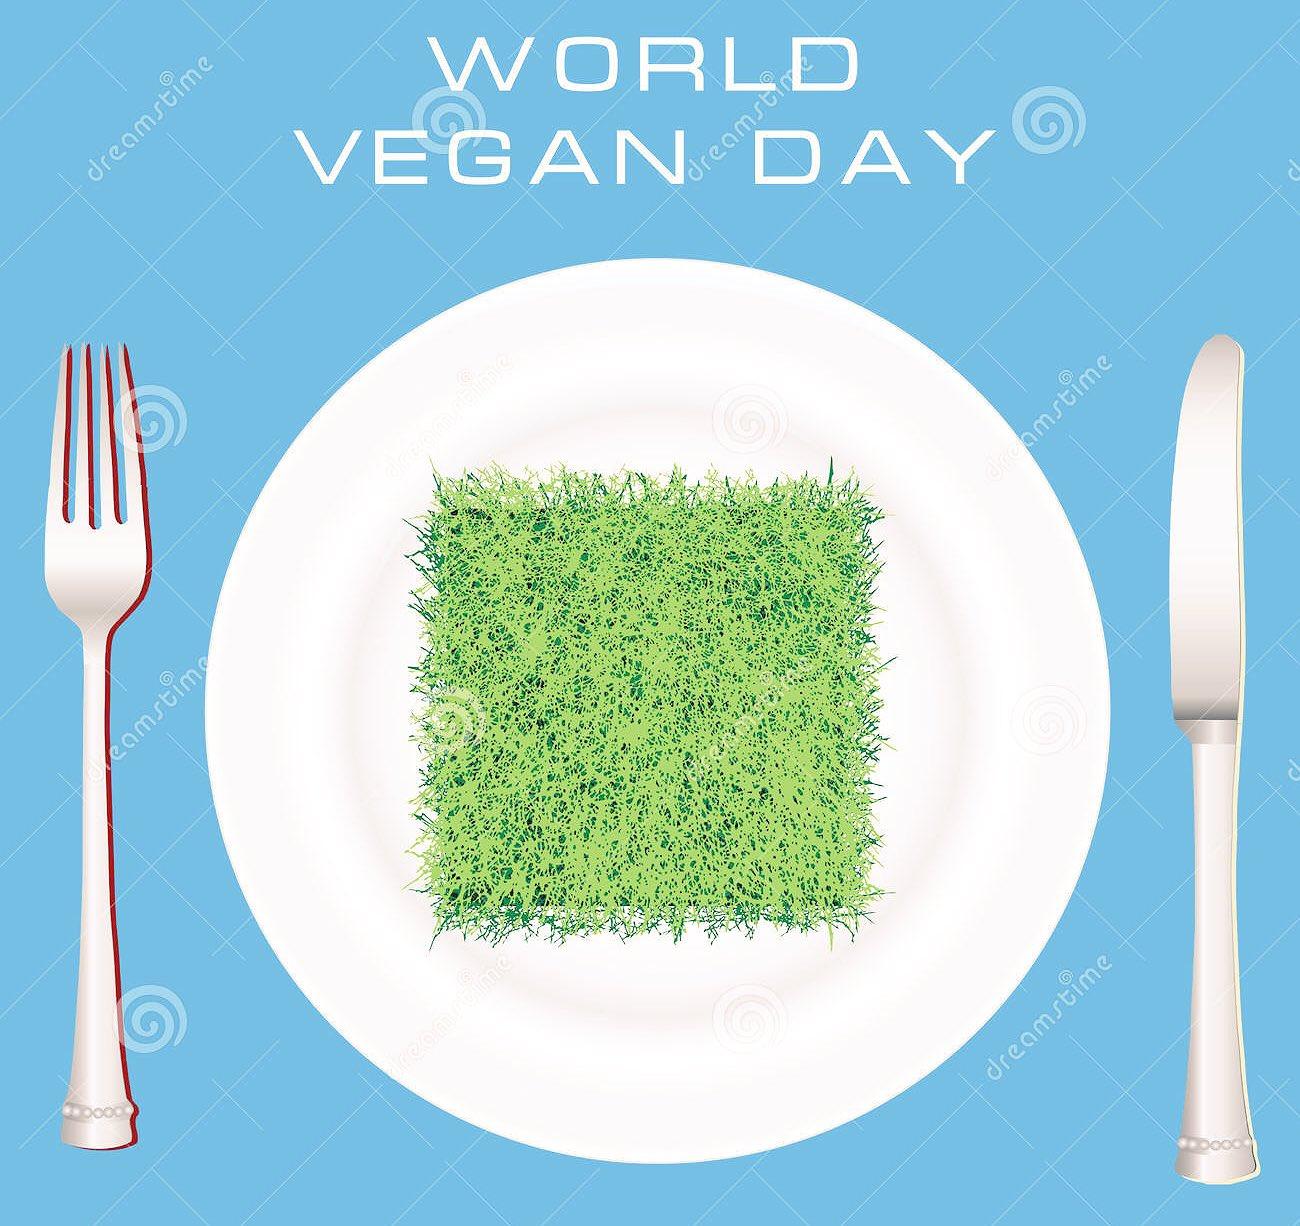 It's world vegan day, go vegan you won't regret it! #vegan #veggie #vegetarian https://t.co/sDvyCU54bL